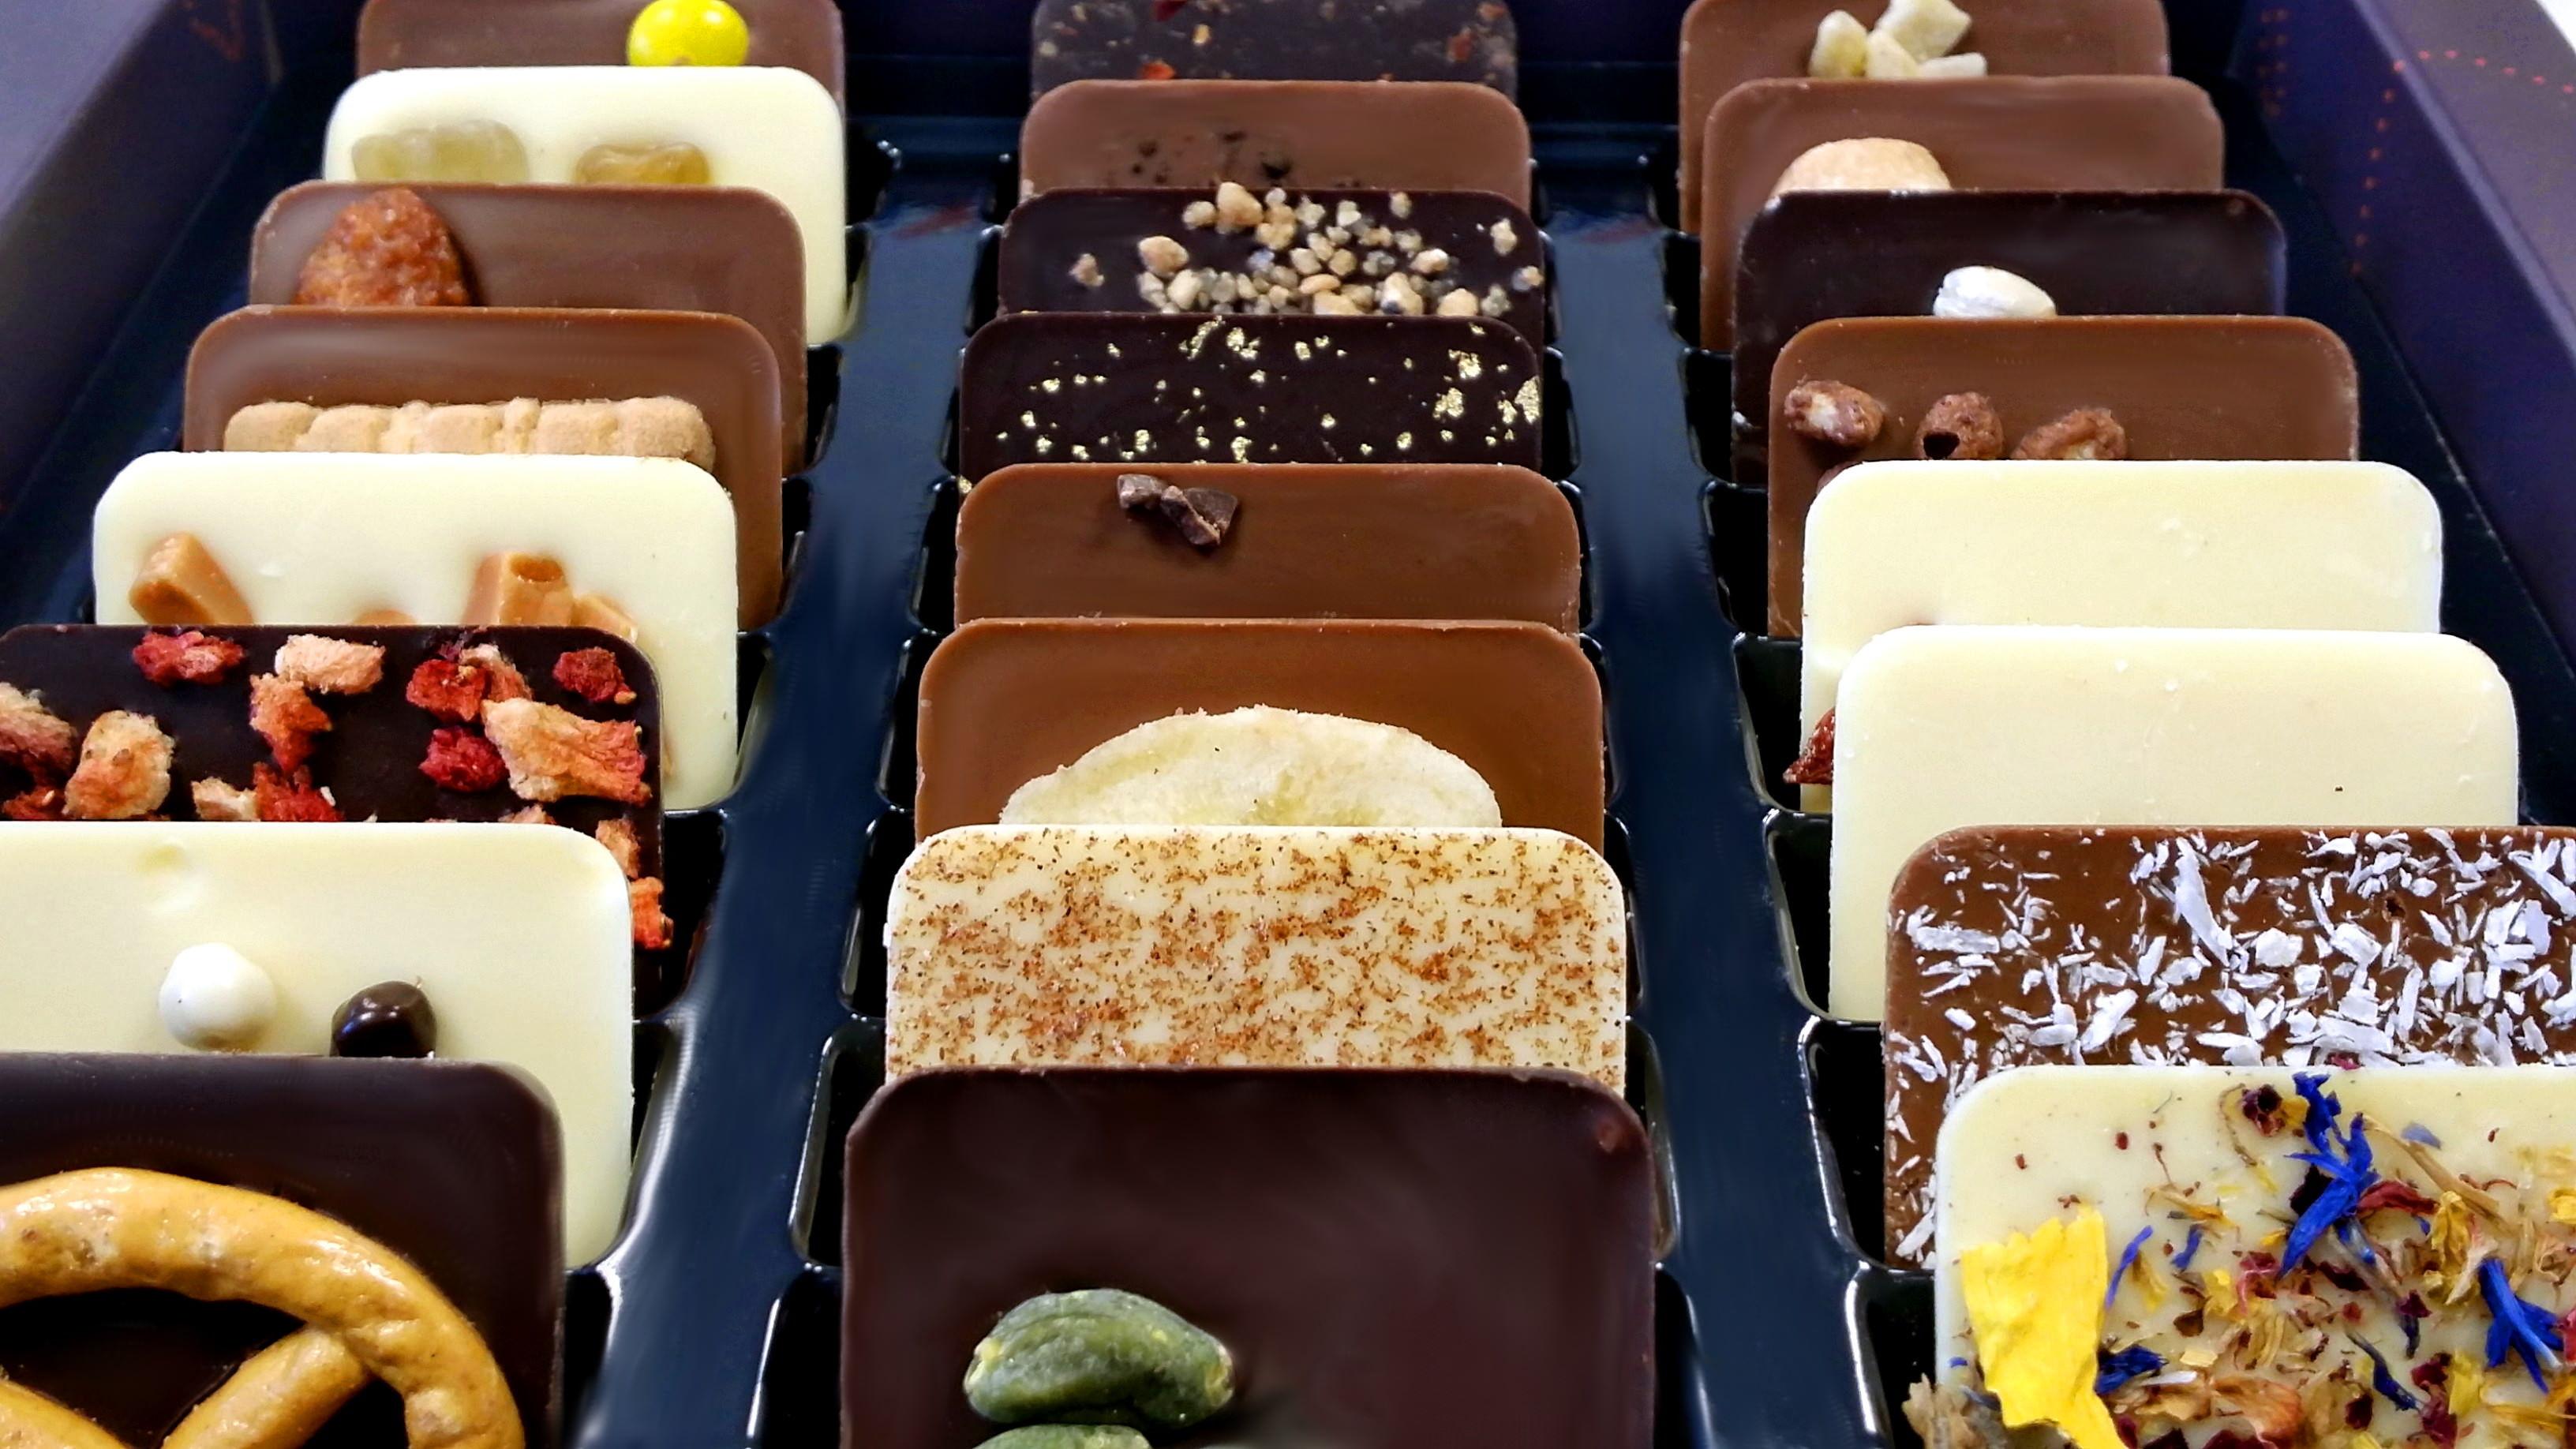 Vergleichapfelschokolade schoki1 minifciwjv